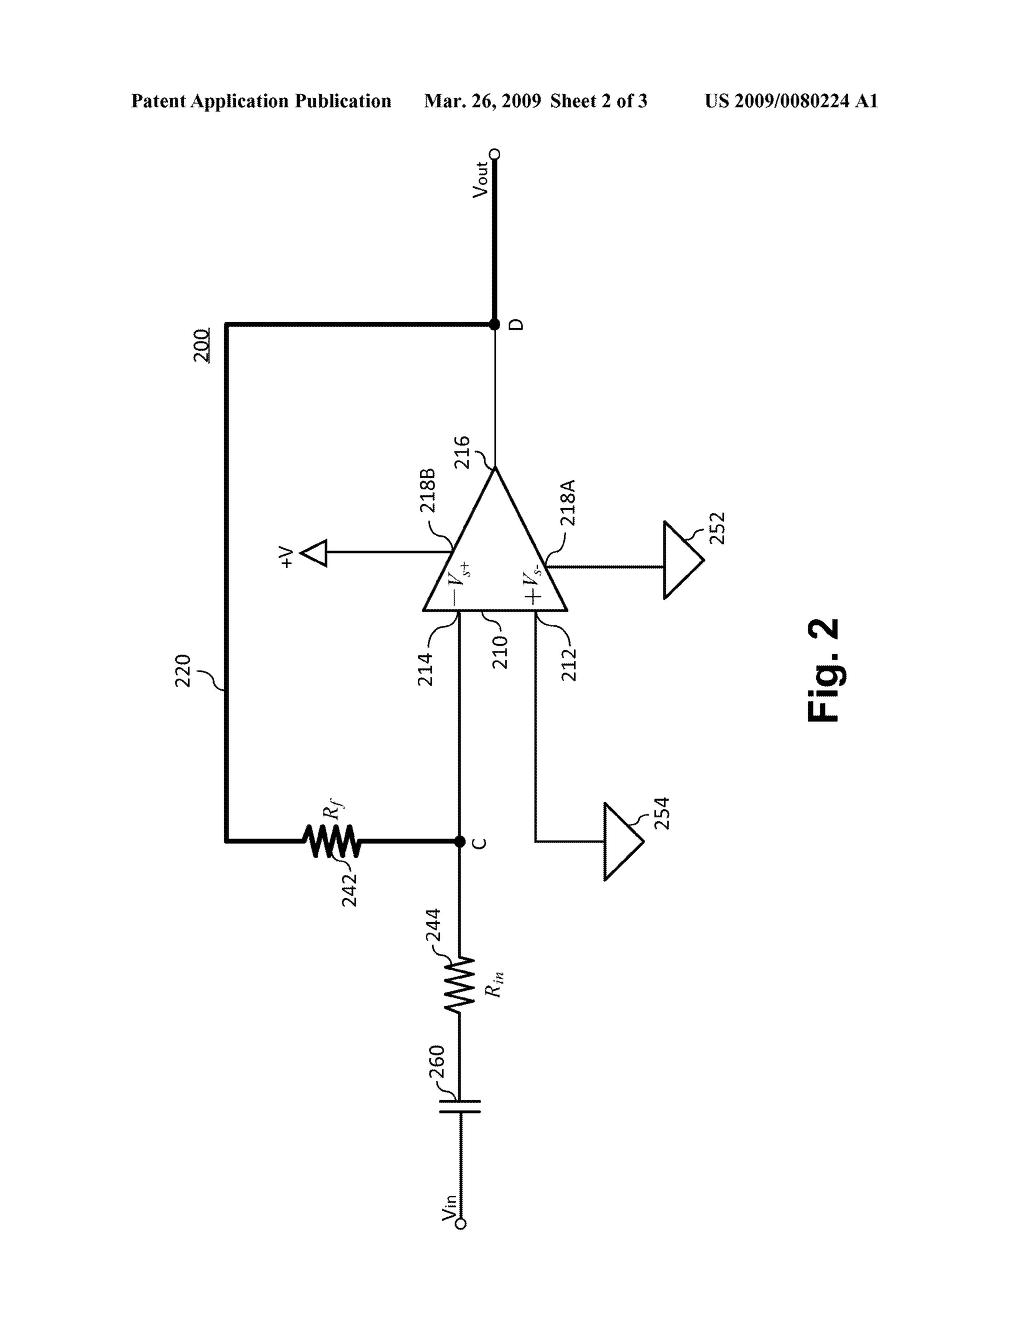 simple ac to dc circuit diagram wiring diagram online Pure Sine Wave Inverter Circuit Diagram ac to dc circuit diagram wiring diagram power inverter circuit diagram simple ac to dc circuit diagram